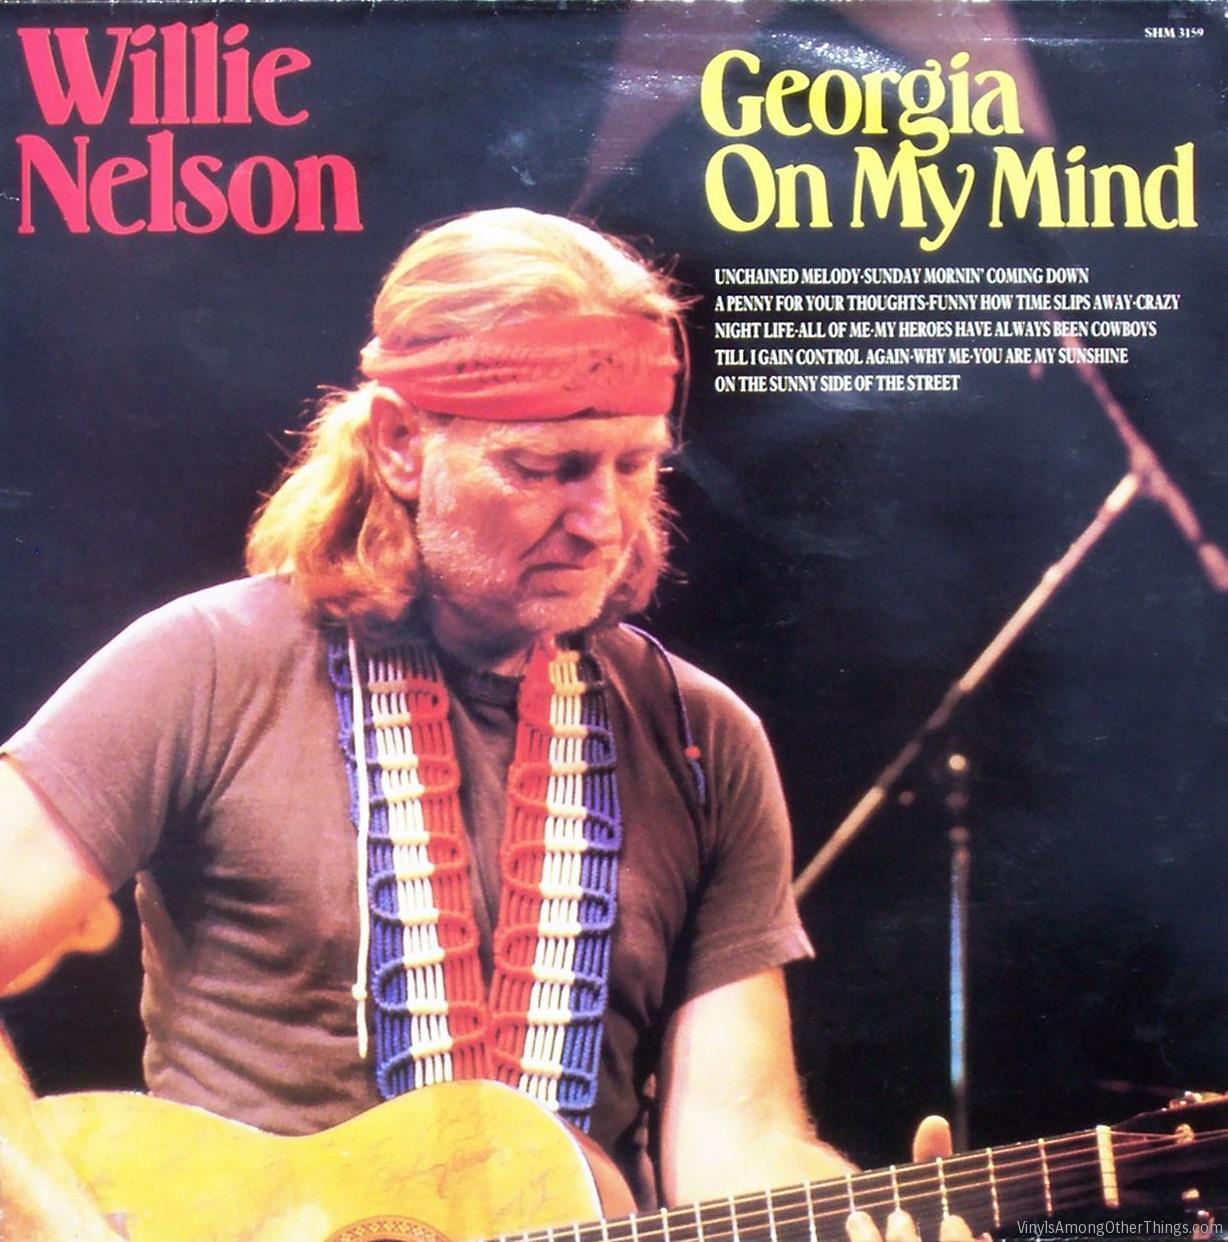 187 Willie Nelson Georgia On My Mind